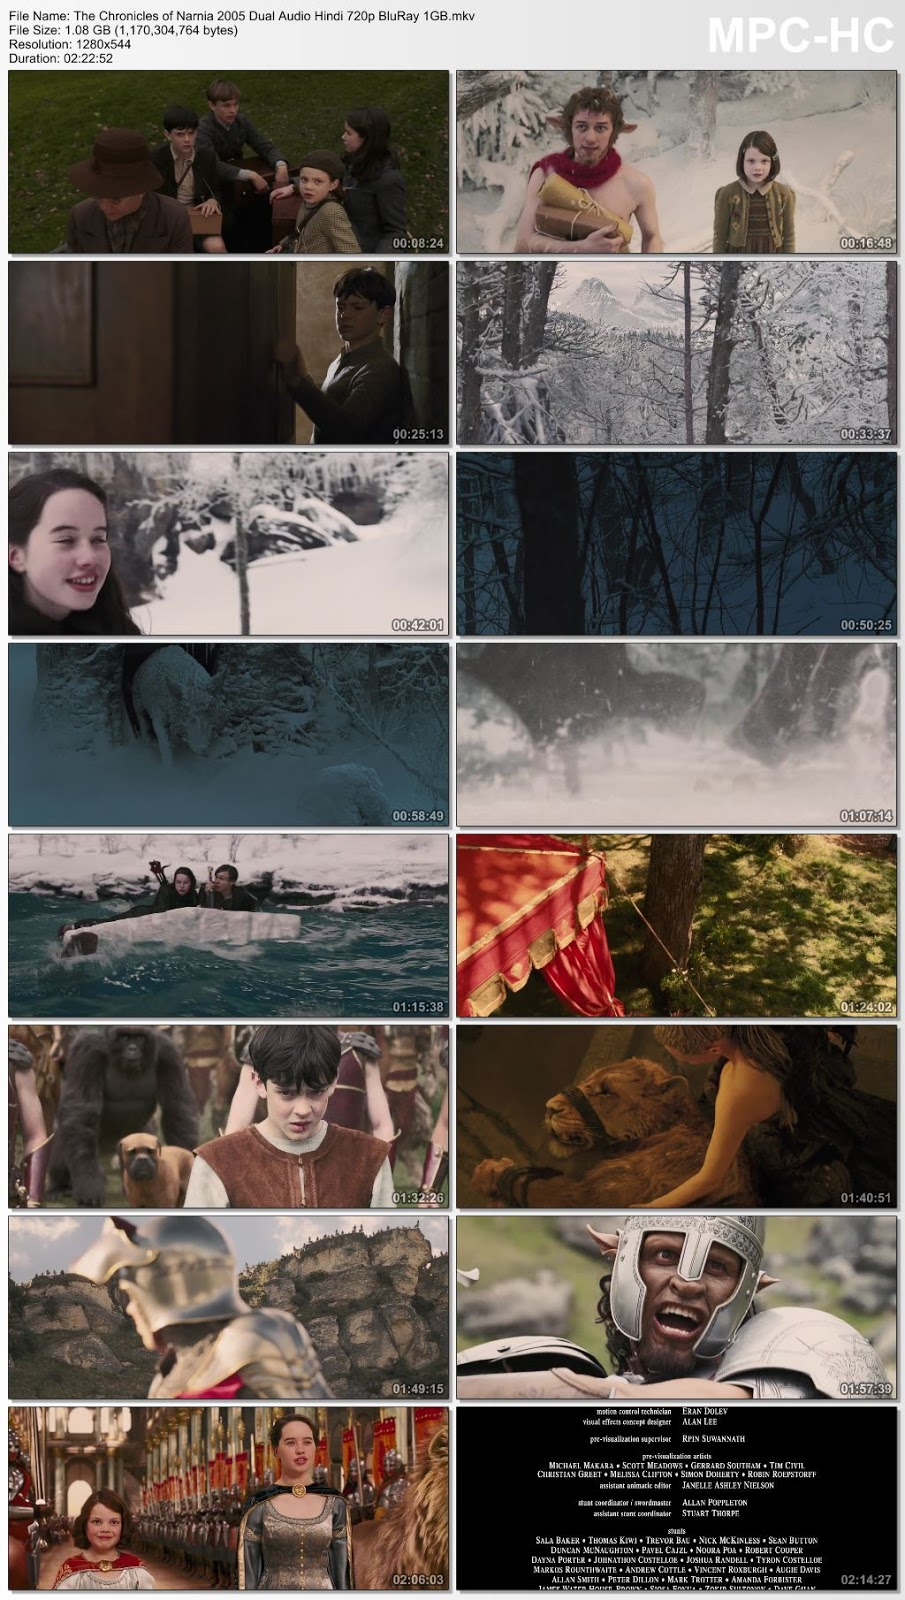 The Chronicles of Narnia 2005 Dual Audio Hindi 480p BluRay 400MB Desirehub